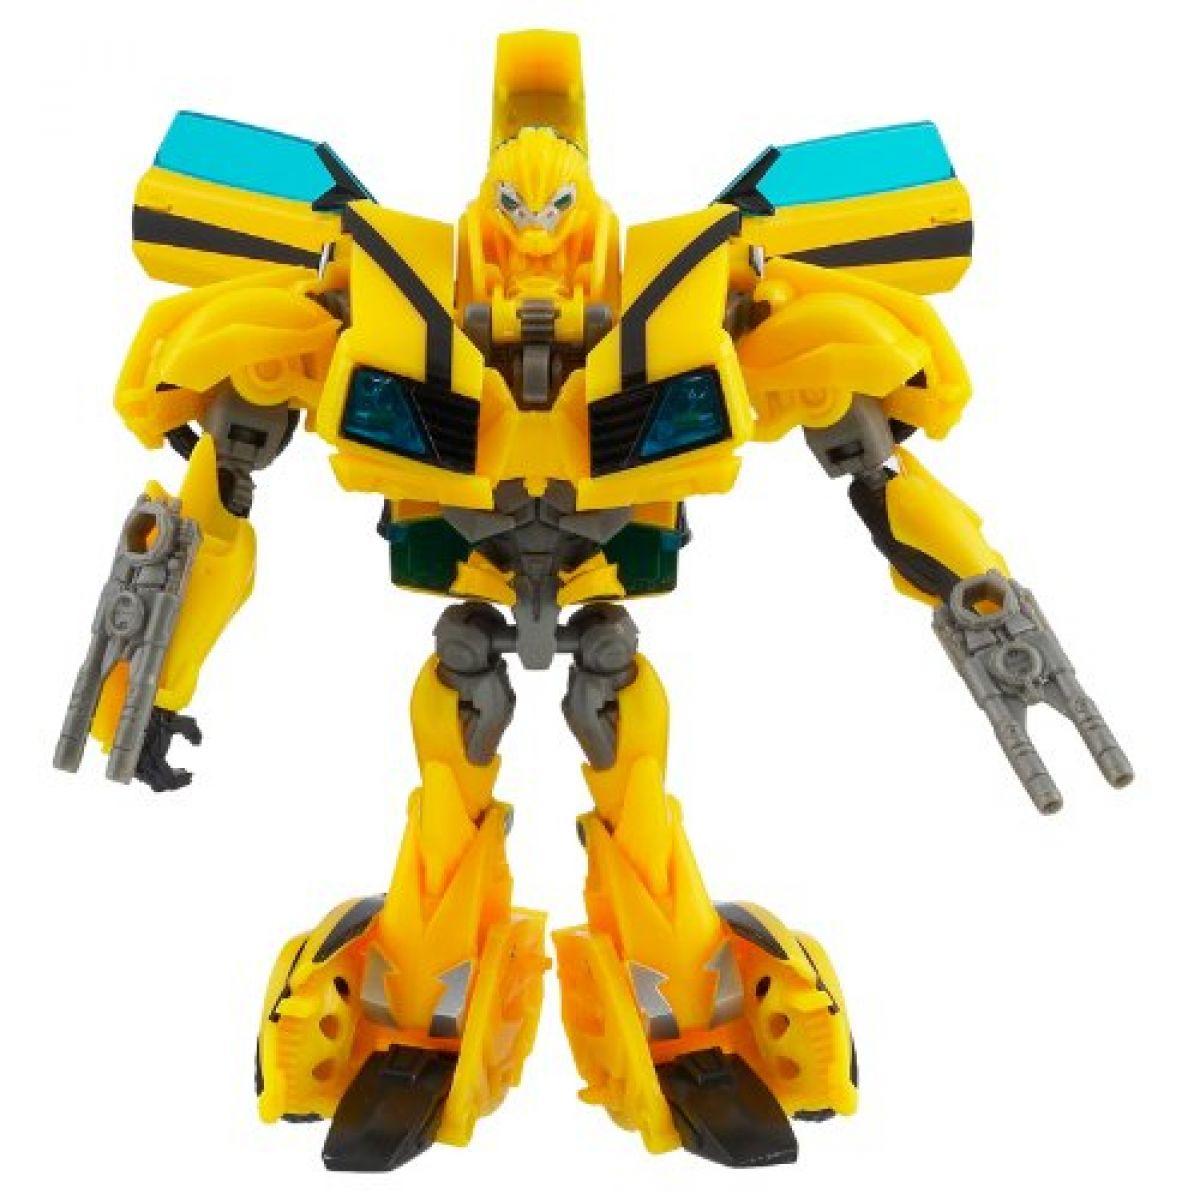 Transformers Robots in Disguise Hasbro - Bumblebee